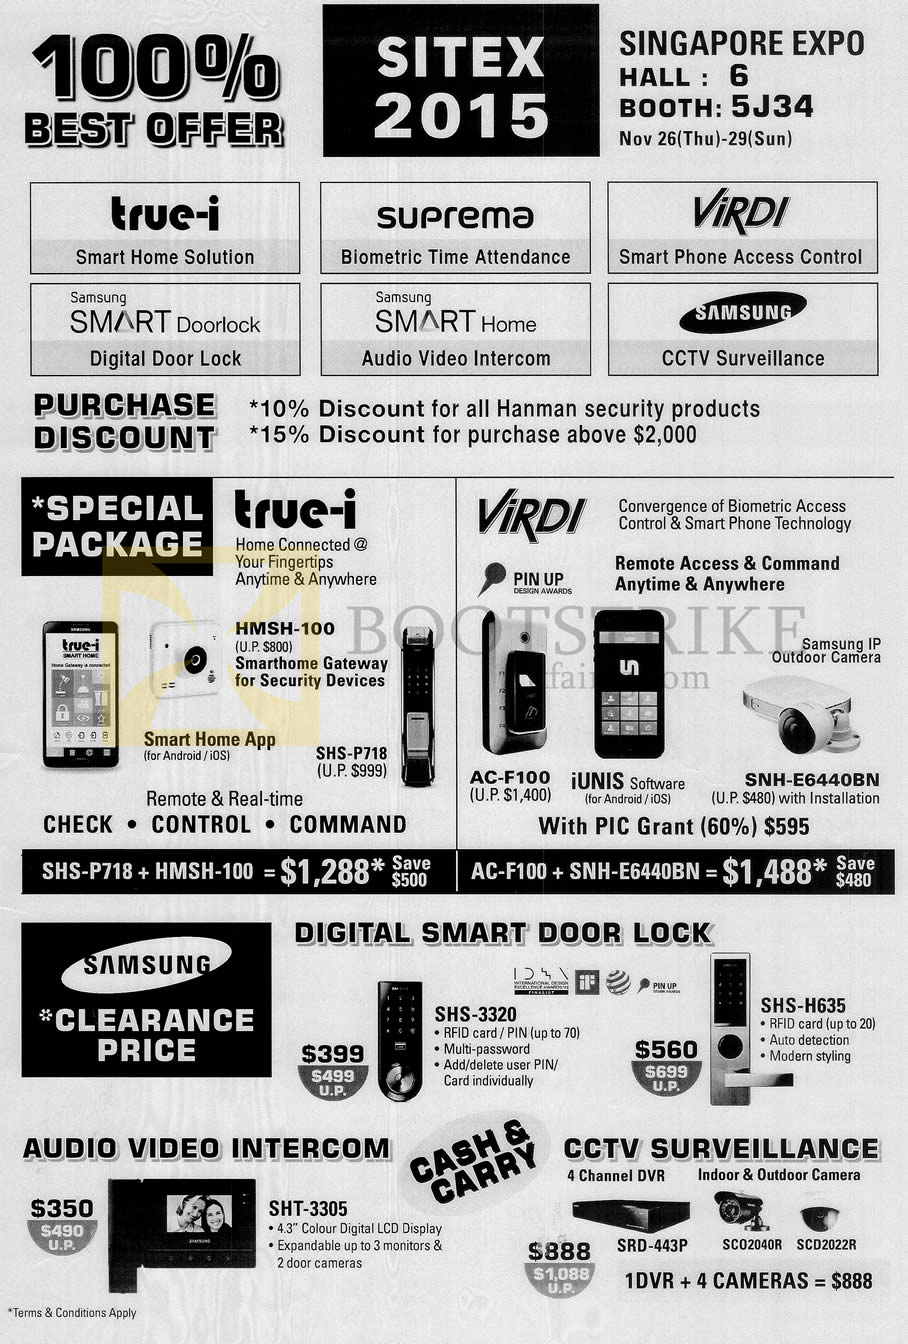 SITEX 2015 price list image brochure of Hanman Samsung Door Locks True-I Security Devices, Virdi AC-F100, IUnis, Audio Video Intercom, CCTV Surveillance